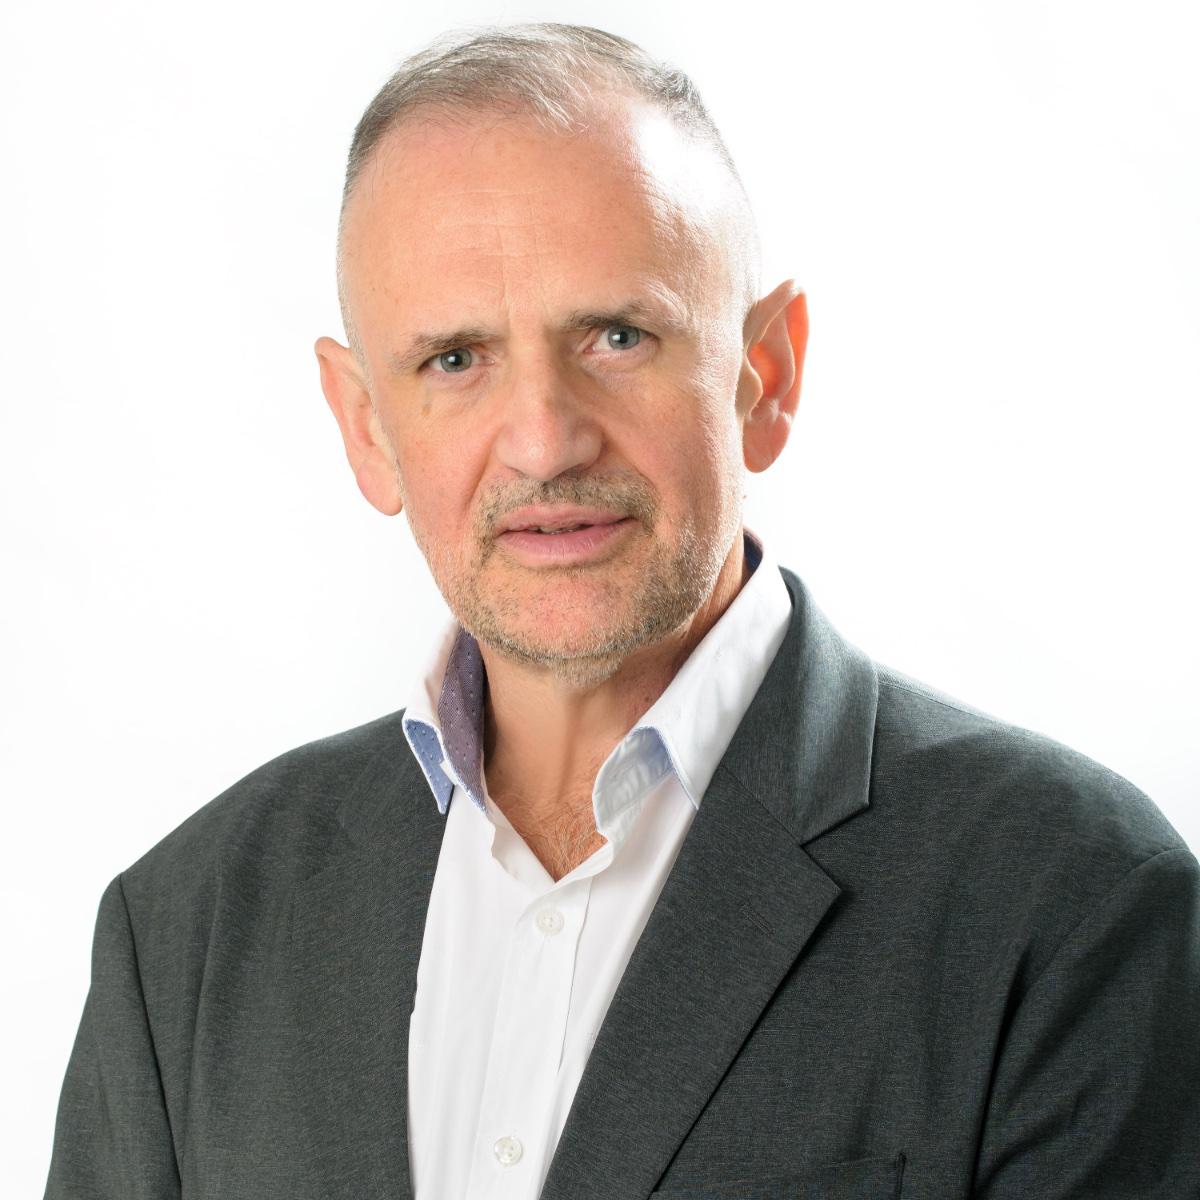 Jaume Carot_president de la Xarxa Vives d'Universitats